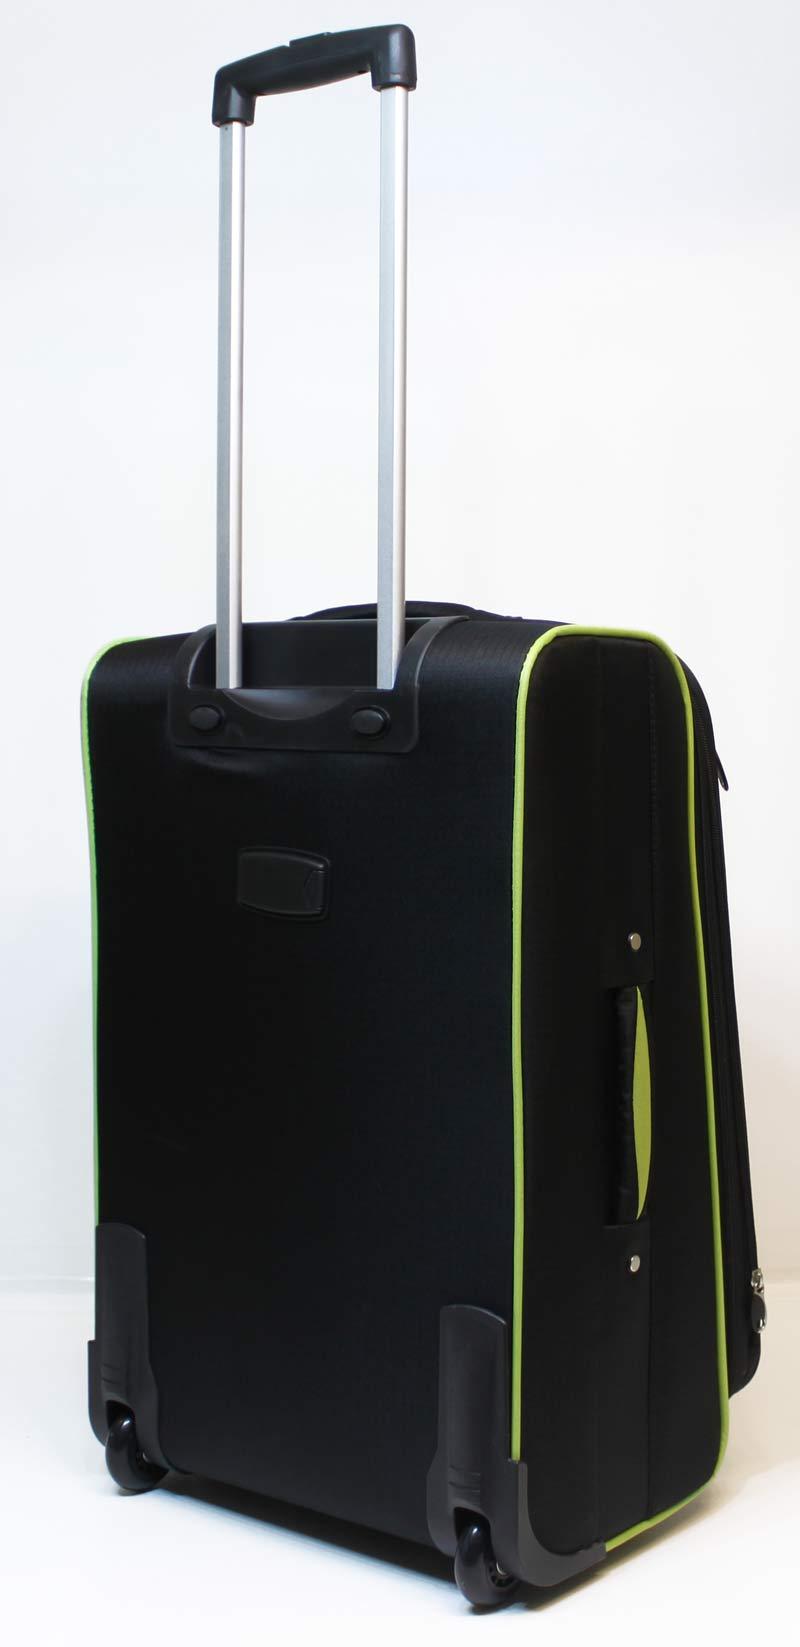 xxl reisekoffer trolley koffer 150 liter schloss nylon. Black Bedroom Furniture Sets. Home Design Ideas